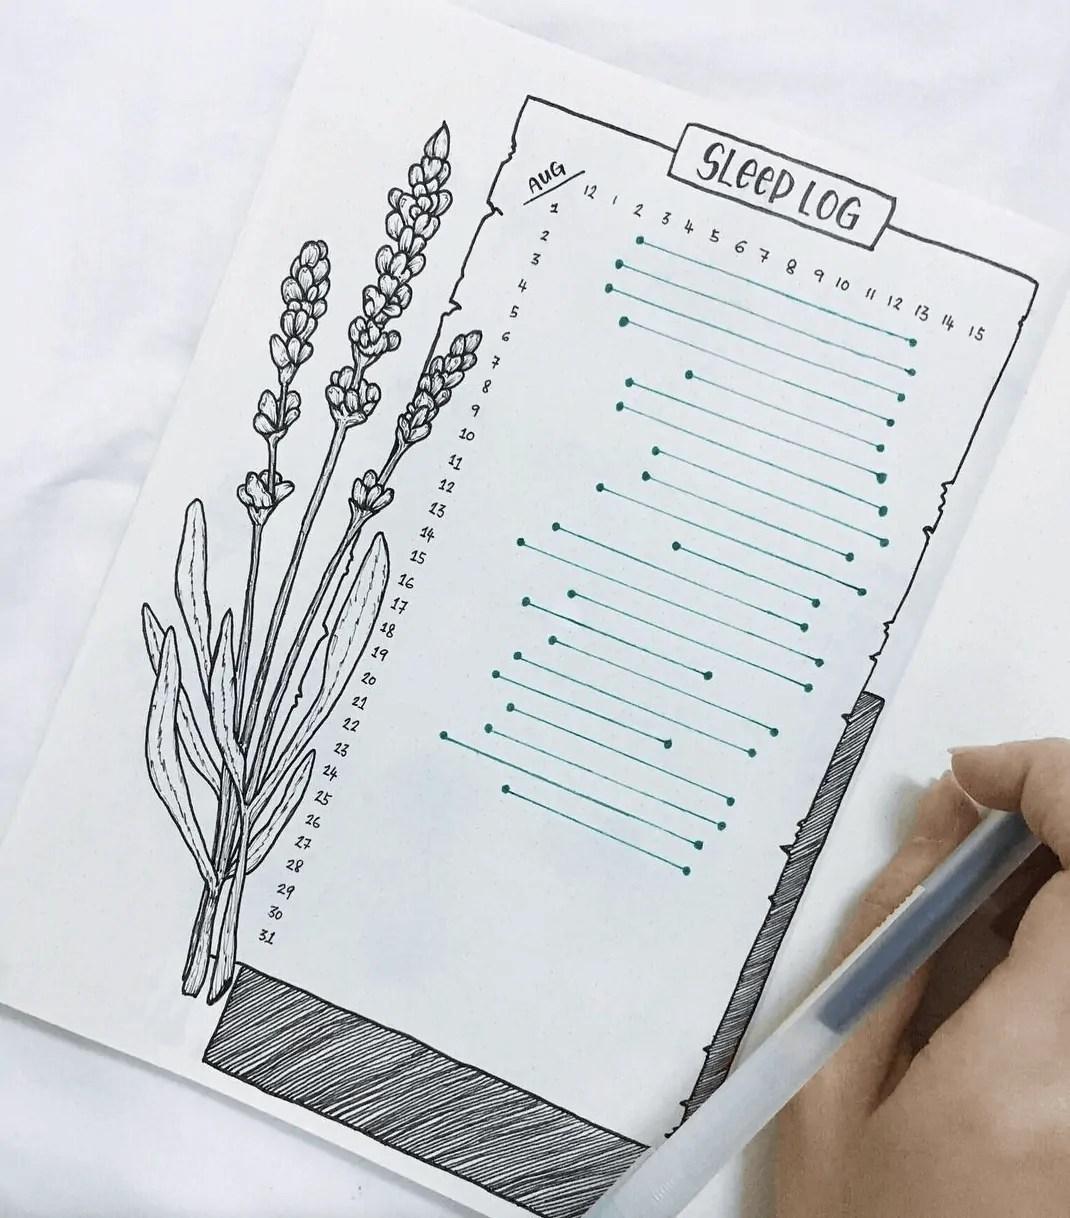 15 Bullet Journal Sleep Tracker Ideas 4